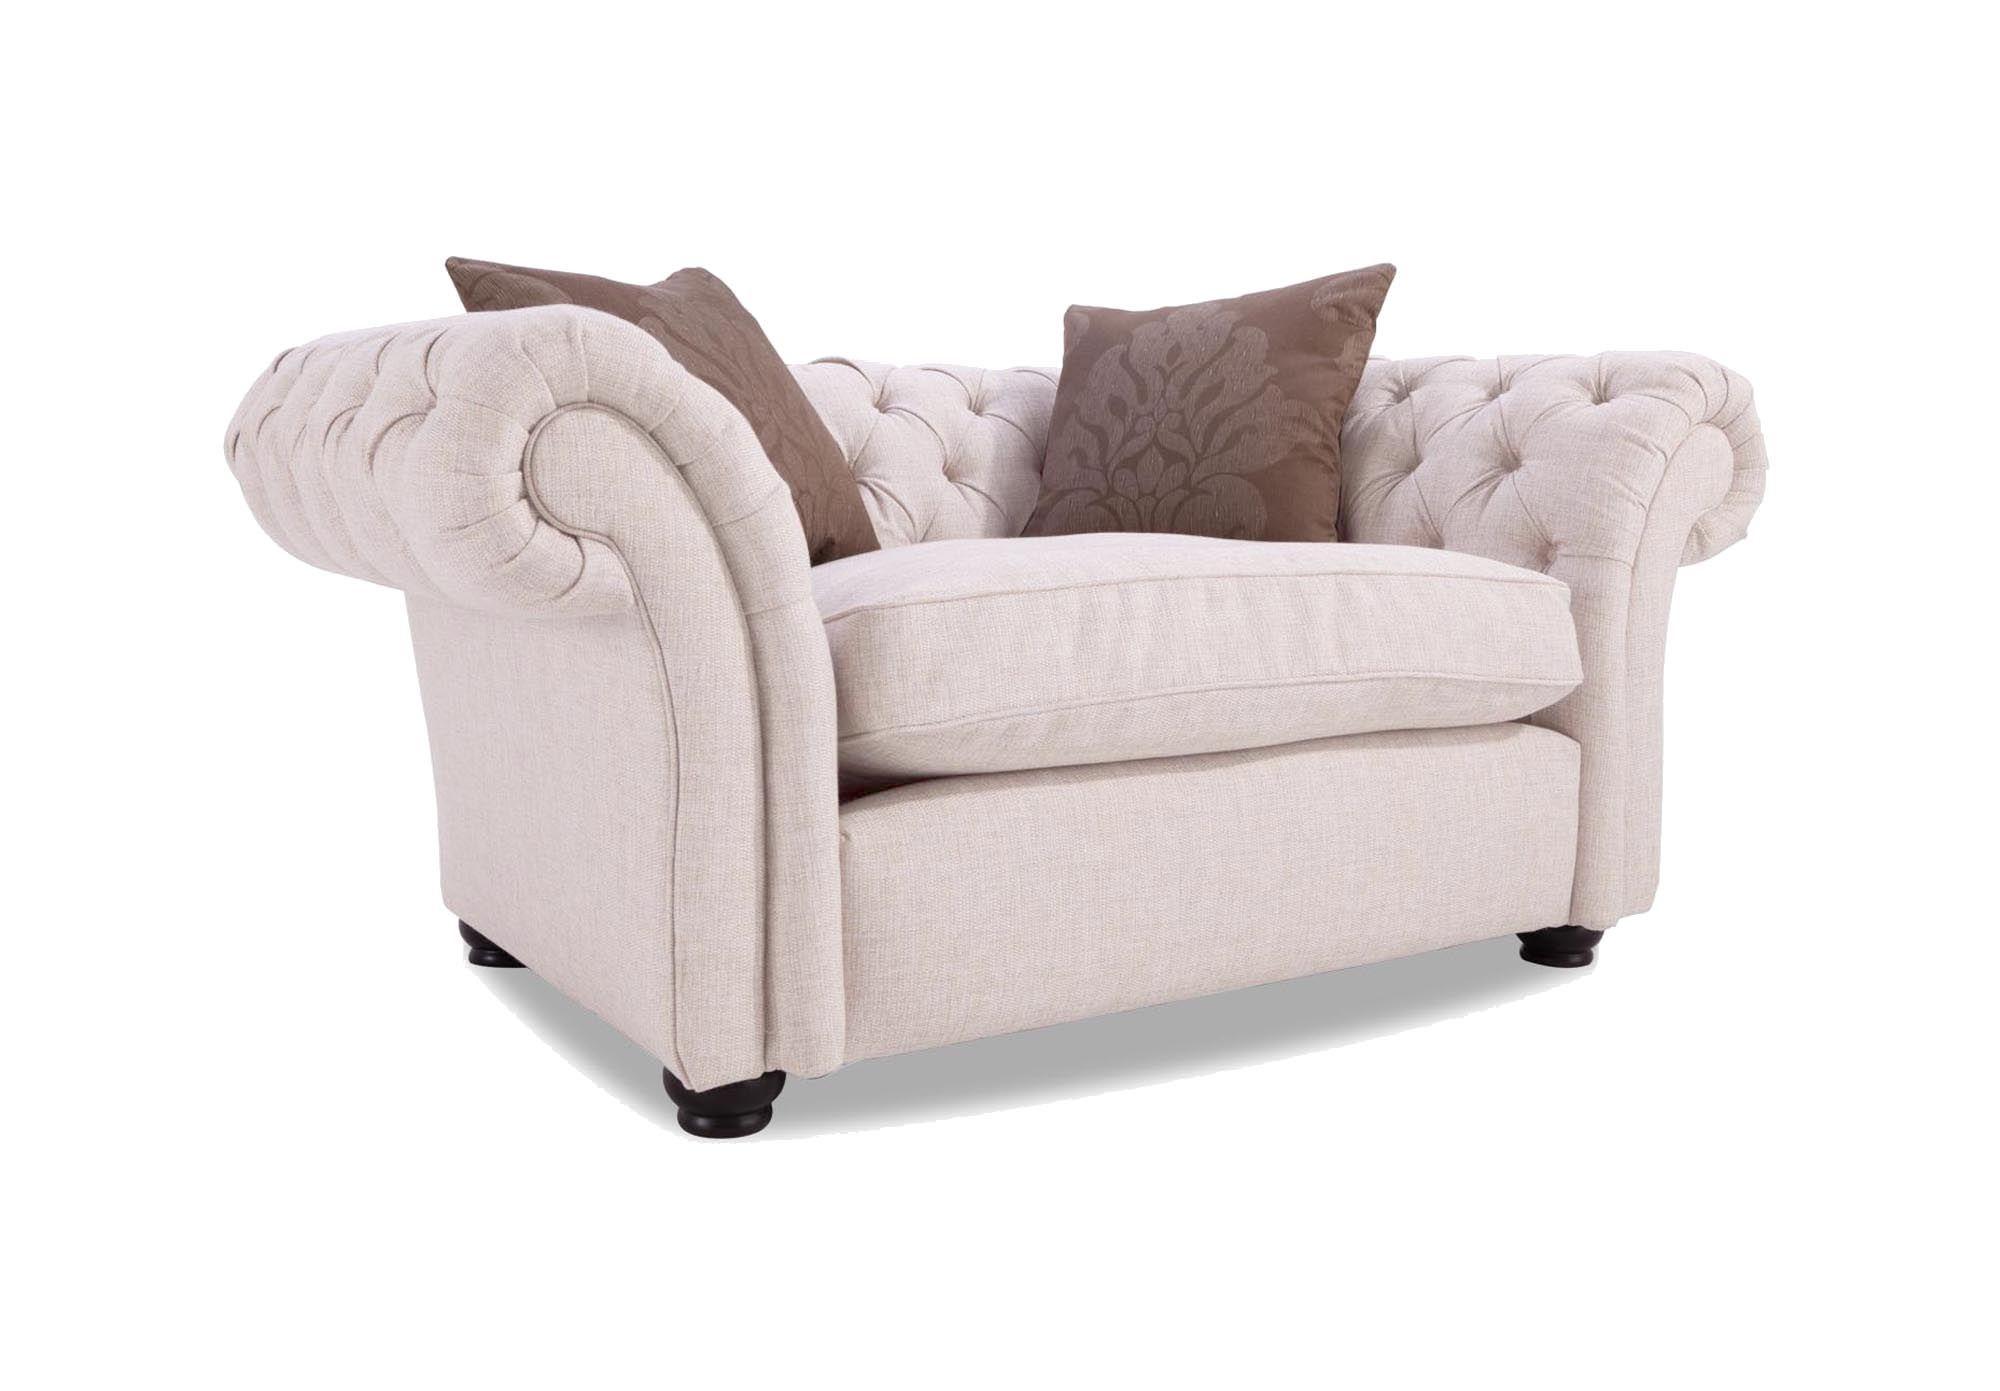 Snuggler Chair Langham Sofa Sets Corner Sofas Leather Sofas Furniture V Luxury Furniture Living Room Furniture Design Living Room Furniture